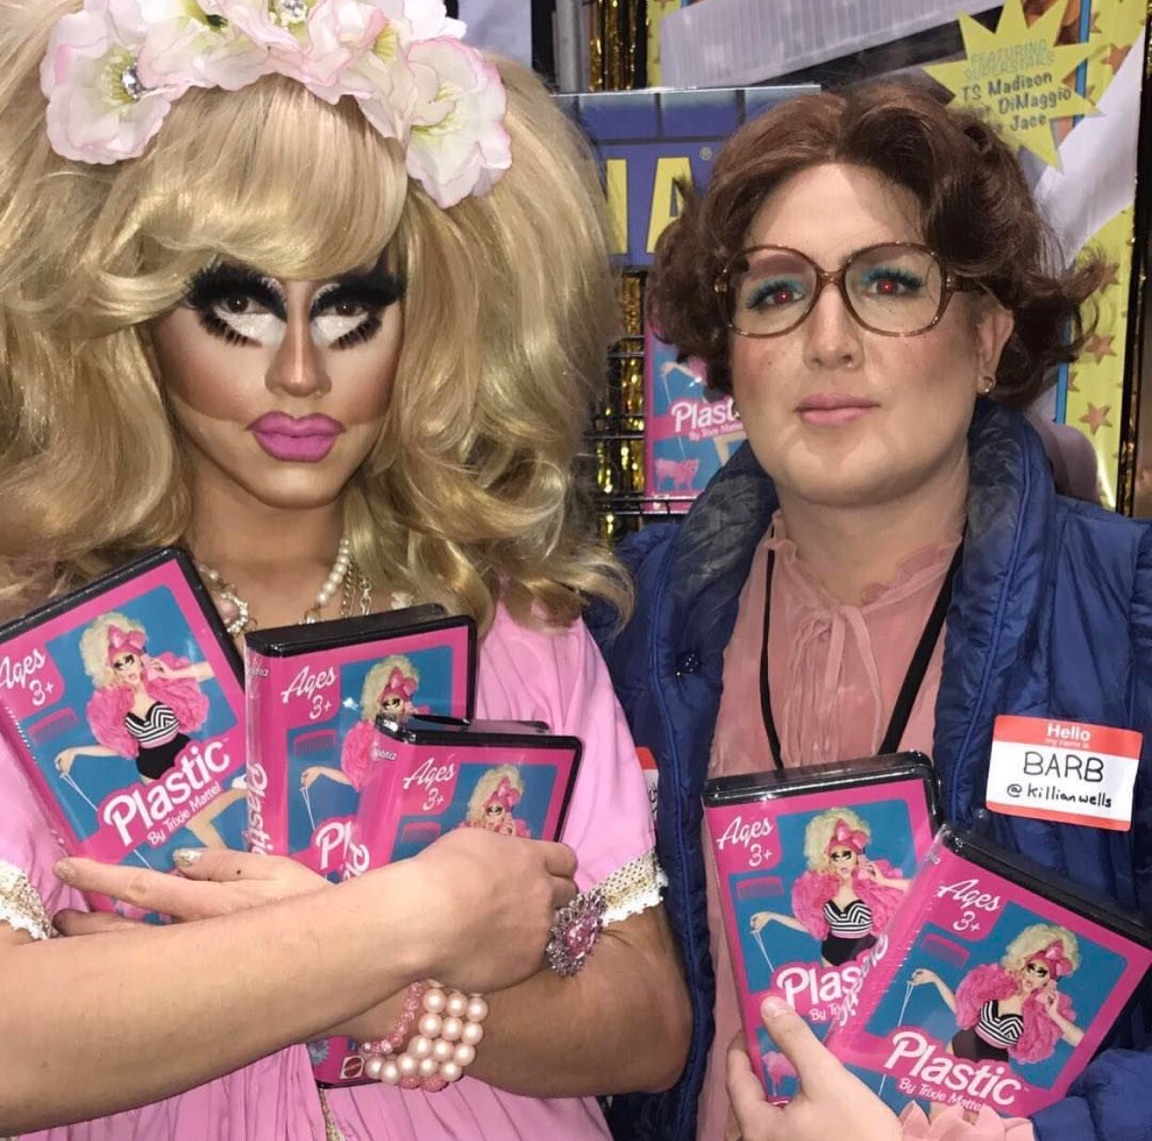 Trixie Mattel at Drag Con